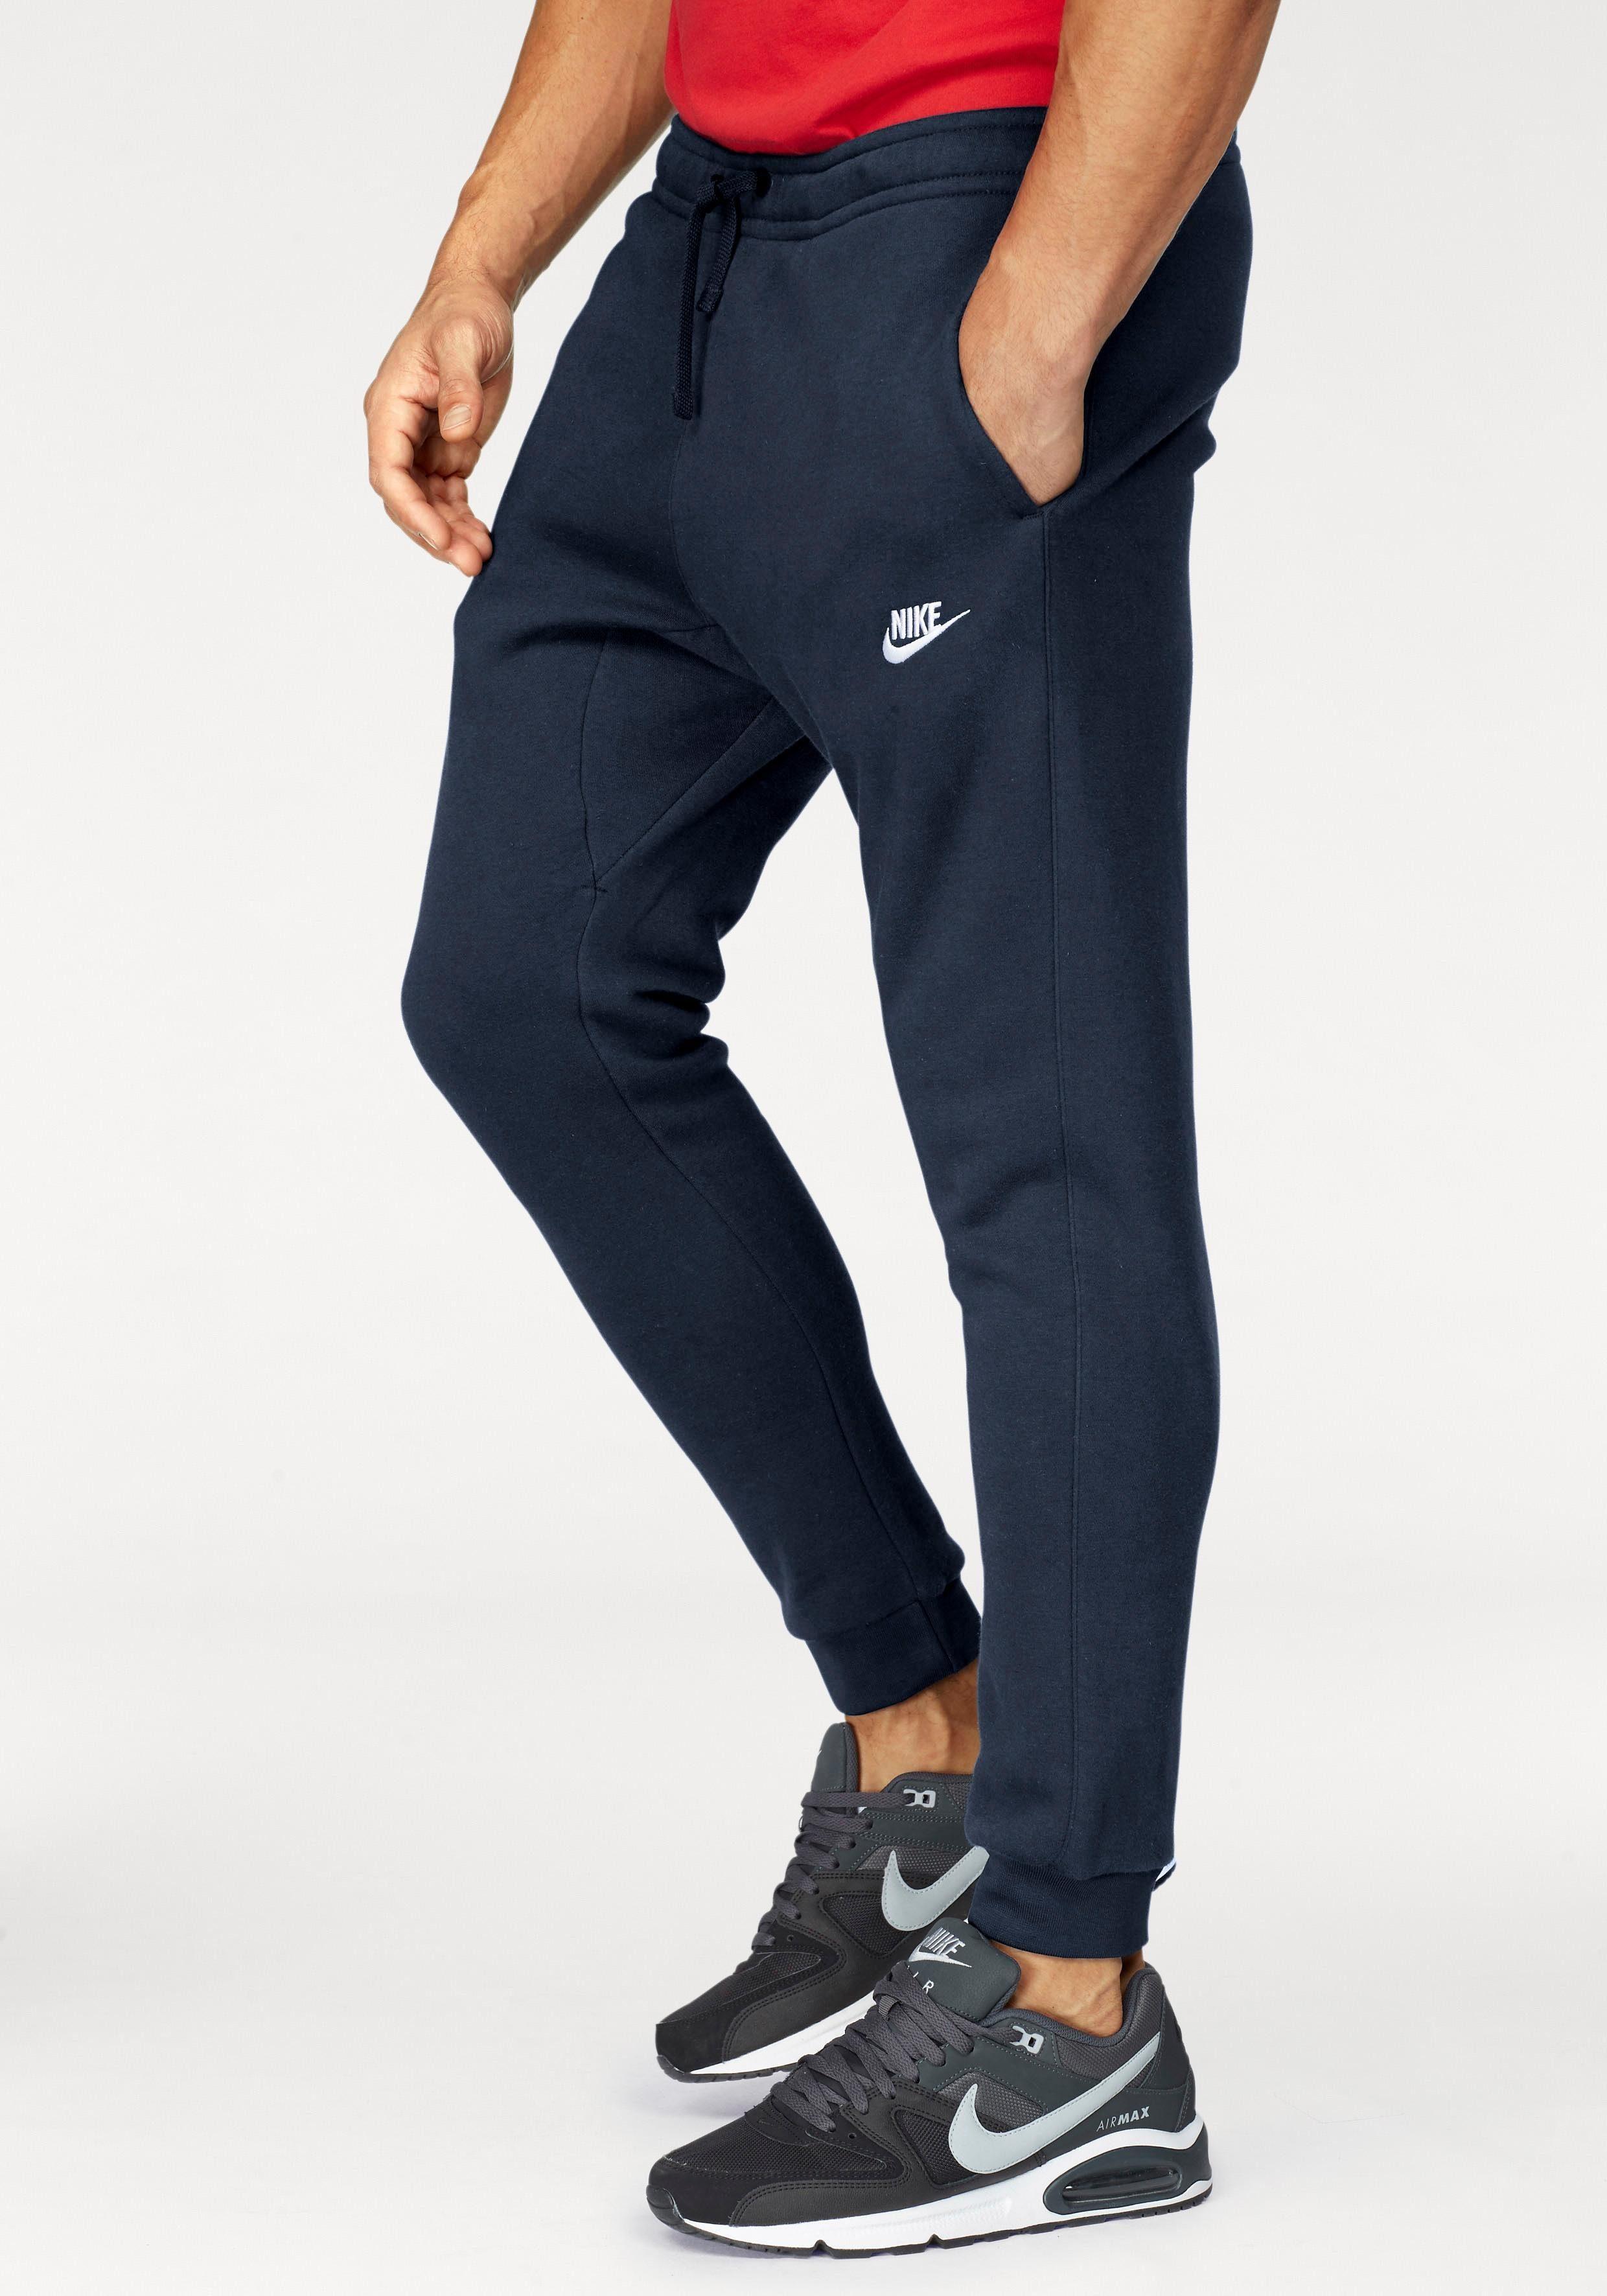 Nike Sportswear Jogginghose »NSW JOGGER« kaufen   OTTO